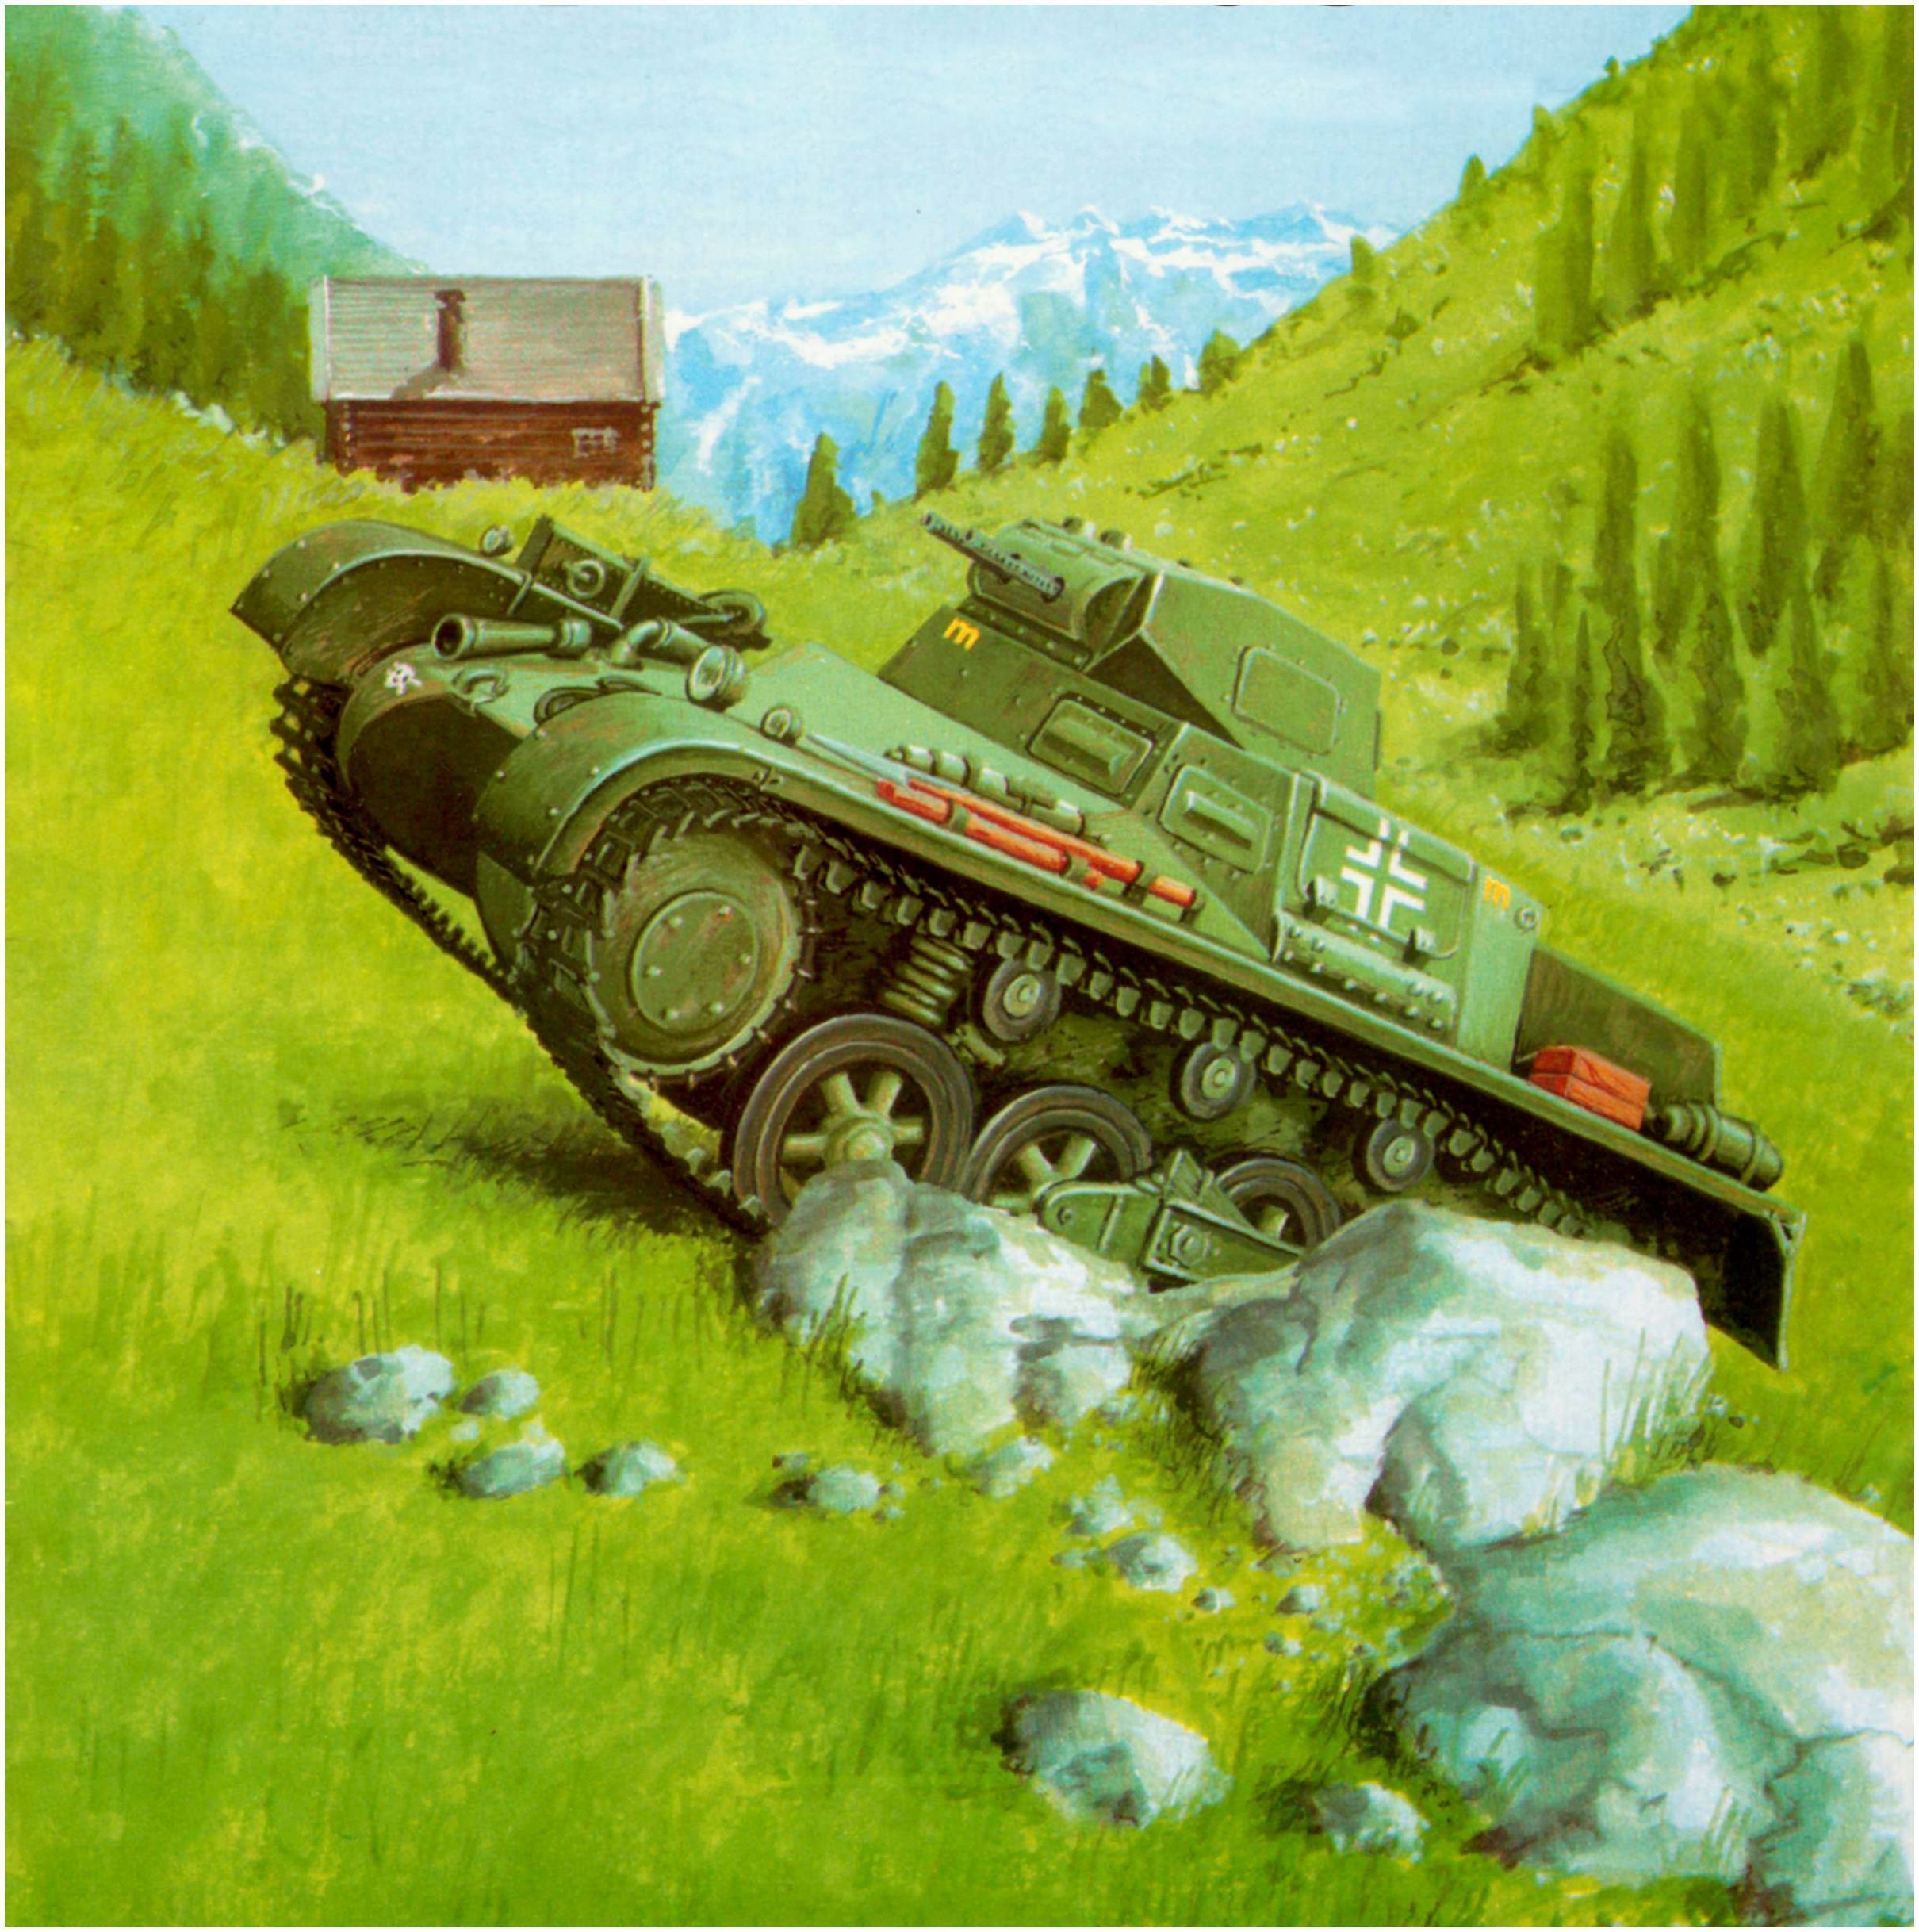 Panzer I Ausf.B de la 3° Compañia, 5th Reg. Panzer, 3th Panzerdivision. Polonia, 1939